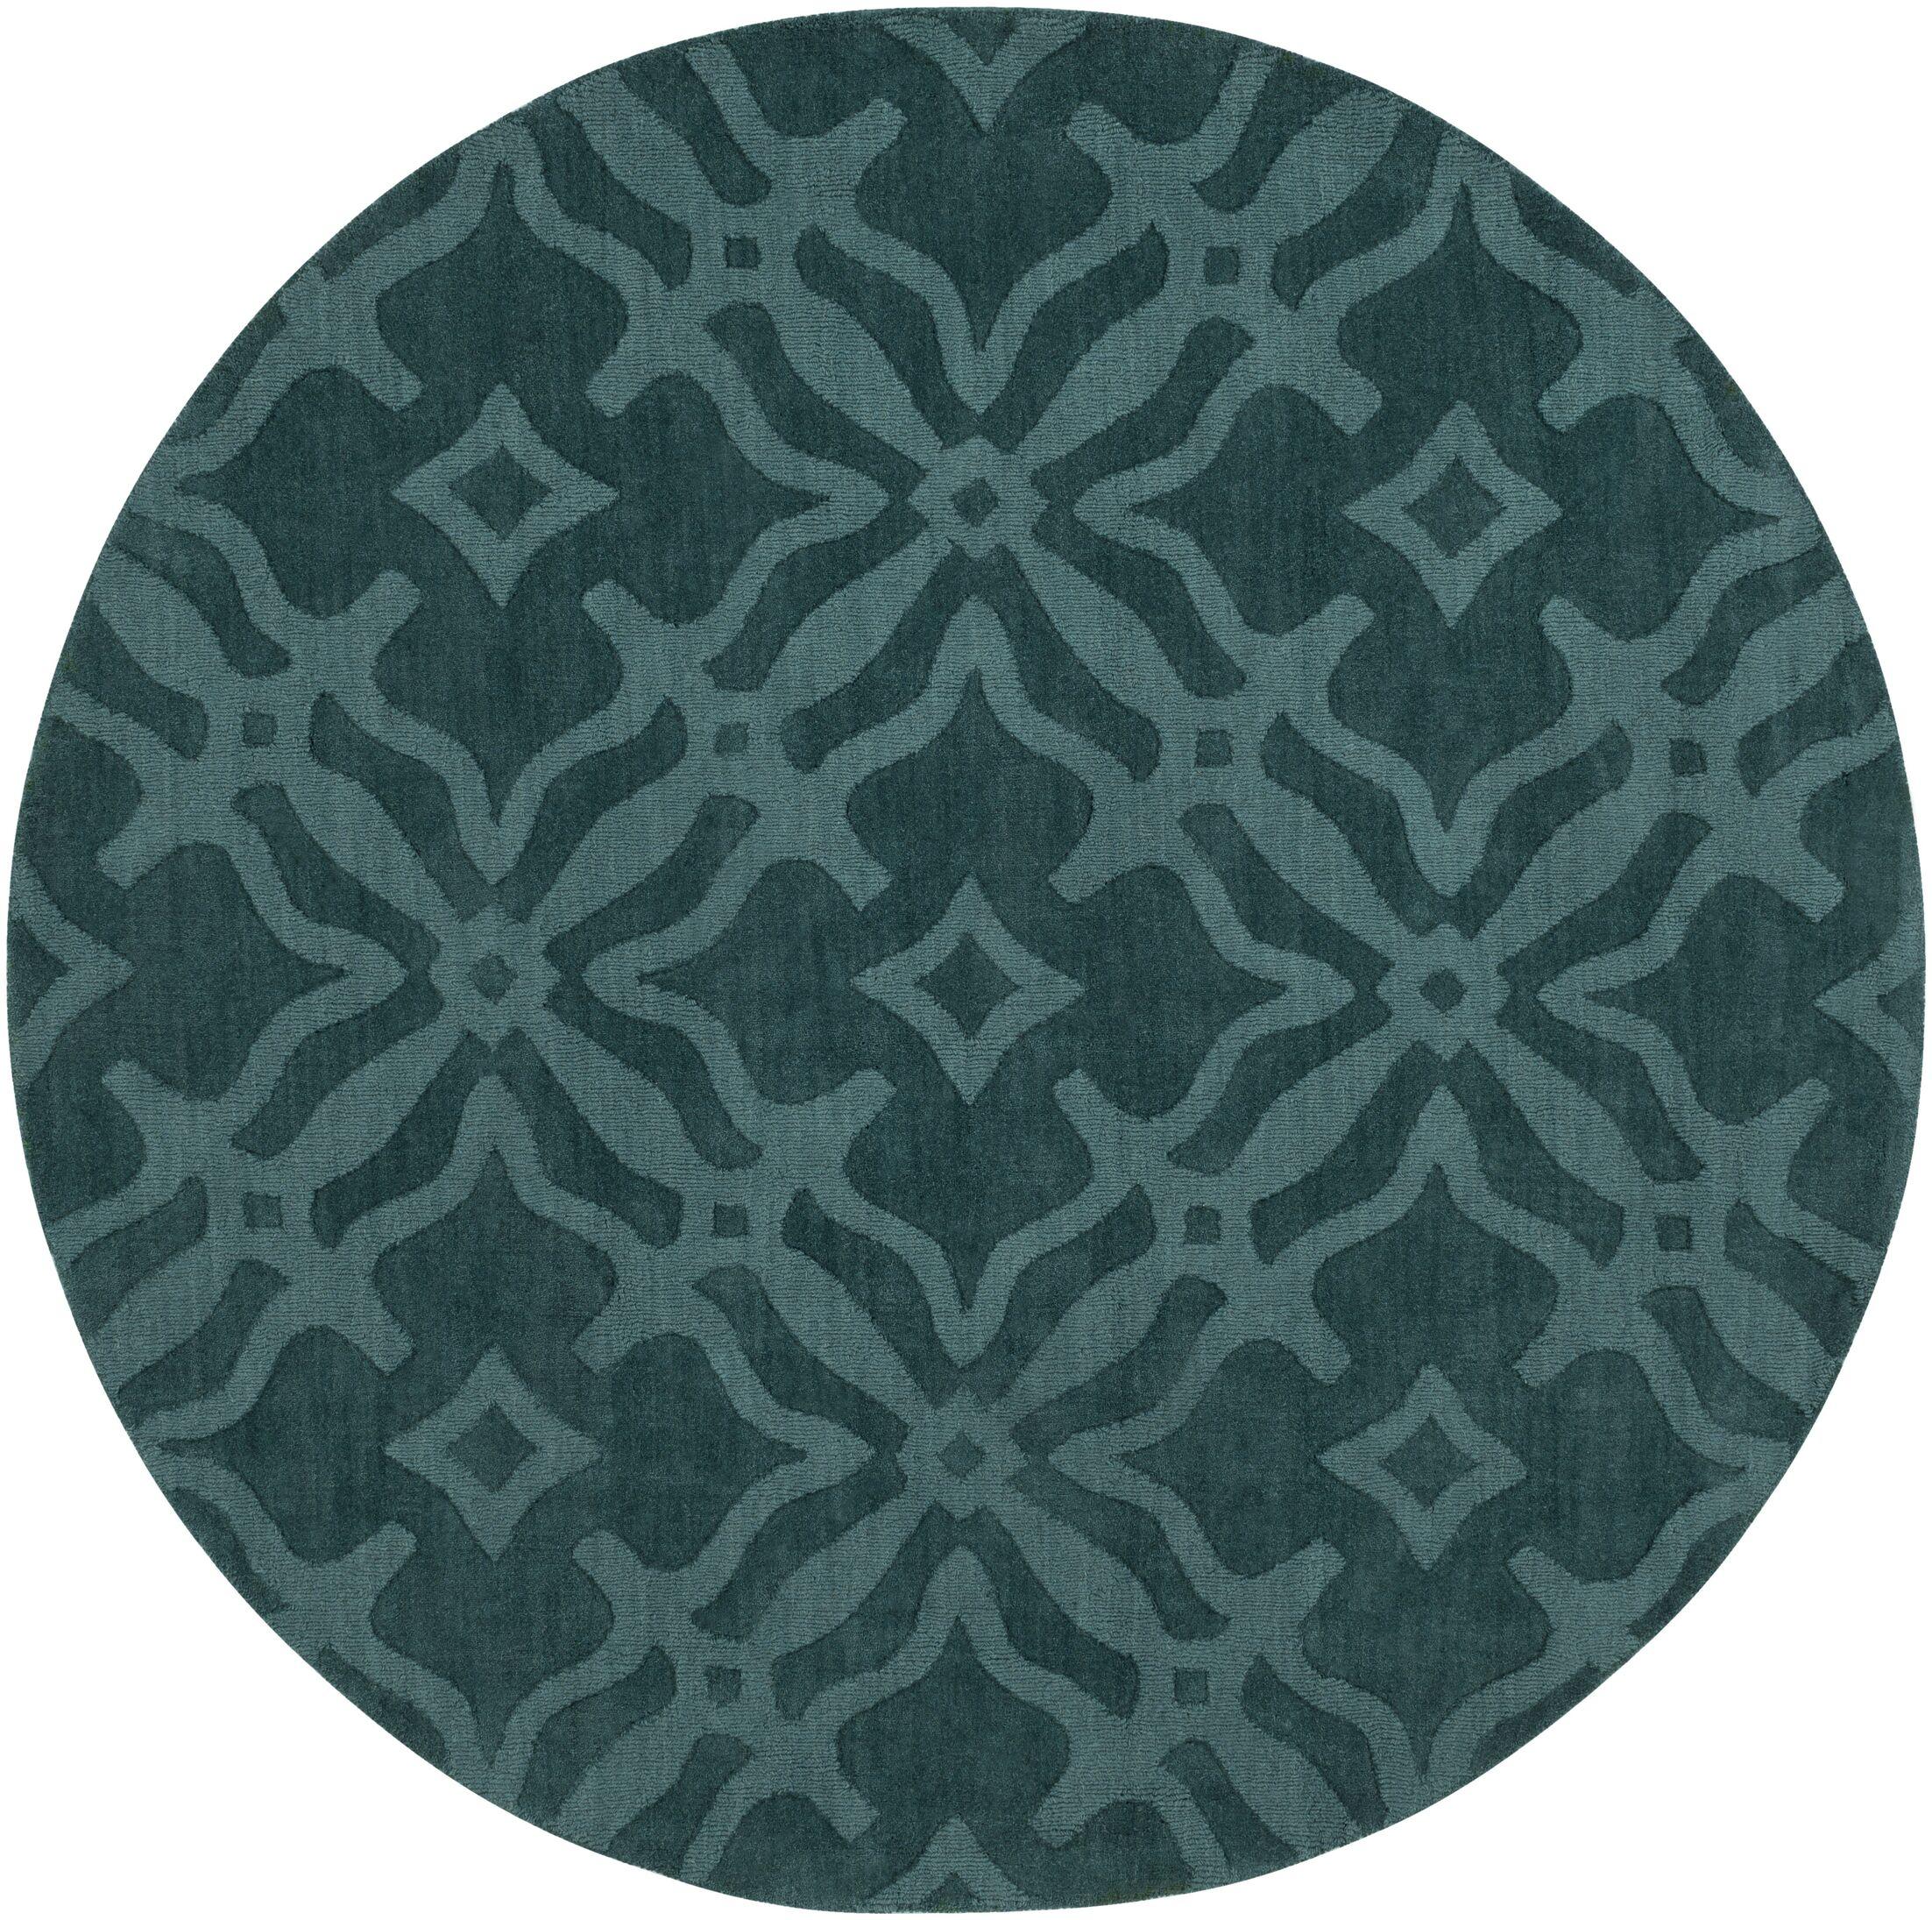 Dutchess Handmade Teal Area Rug Rug Size: Round 9'9